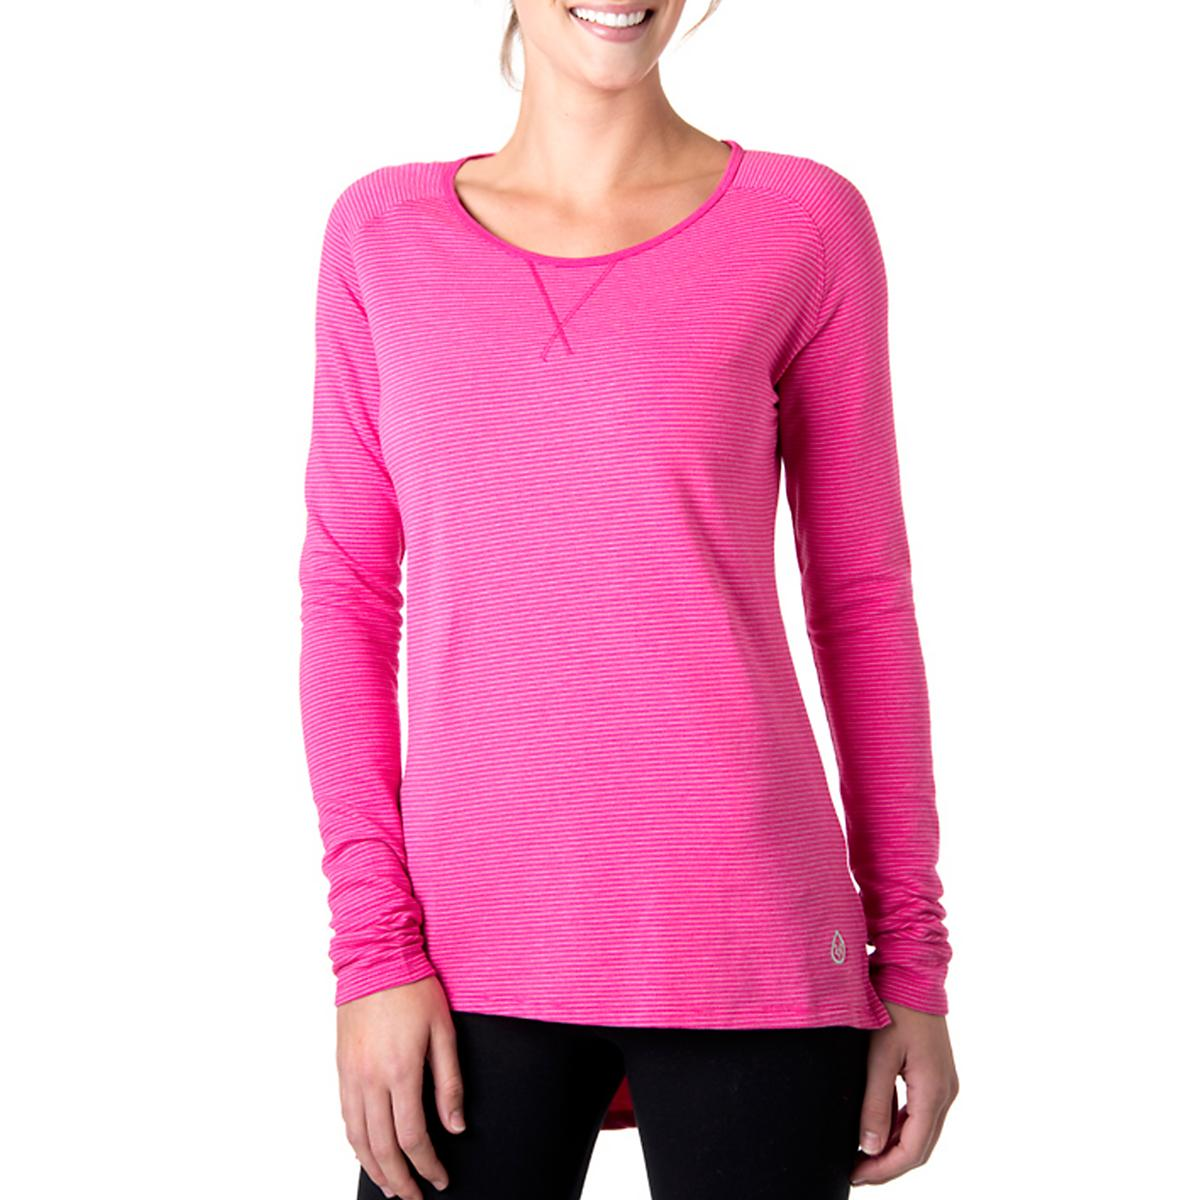 Women's Tasc Performance�Rise Sweatshirt